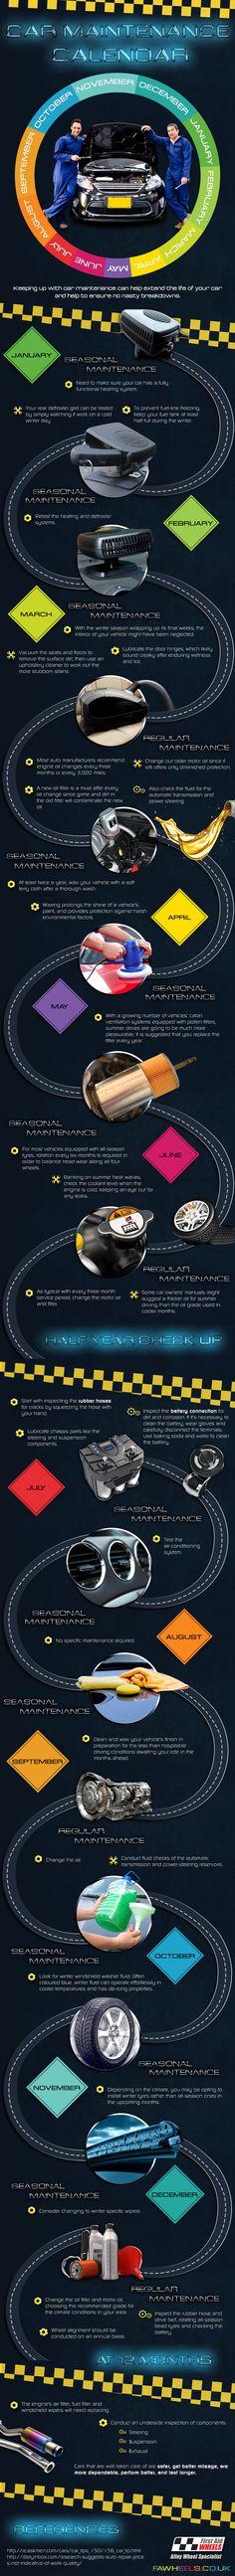 #Car Maintenance Calendar - Do you fancy an infographic? There are a lot of them online, but if you want your own please visit http://www.linfografico.com/prezzi/ Online girano molte infografiche, se ne vuoi realizzare una tutta tua visita http://www.linfografico.com/prezzi/